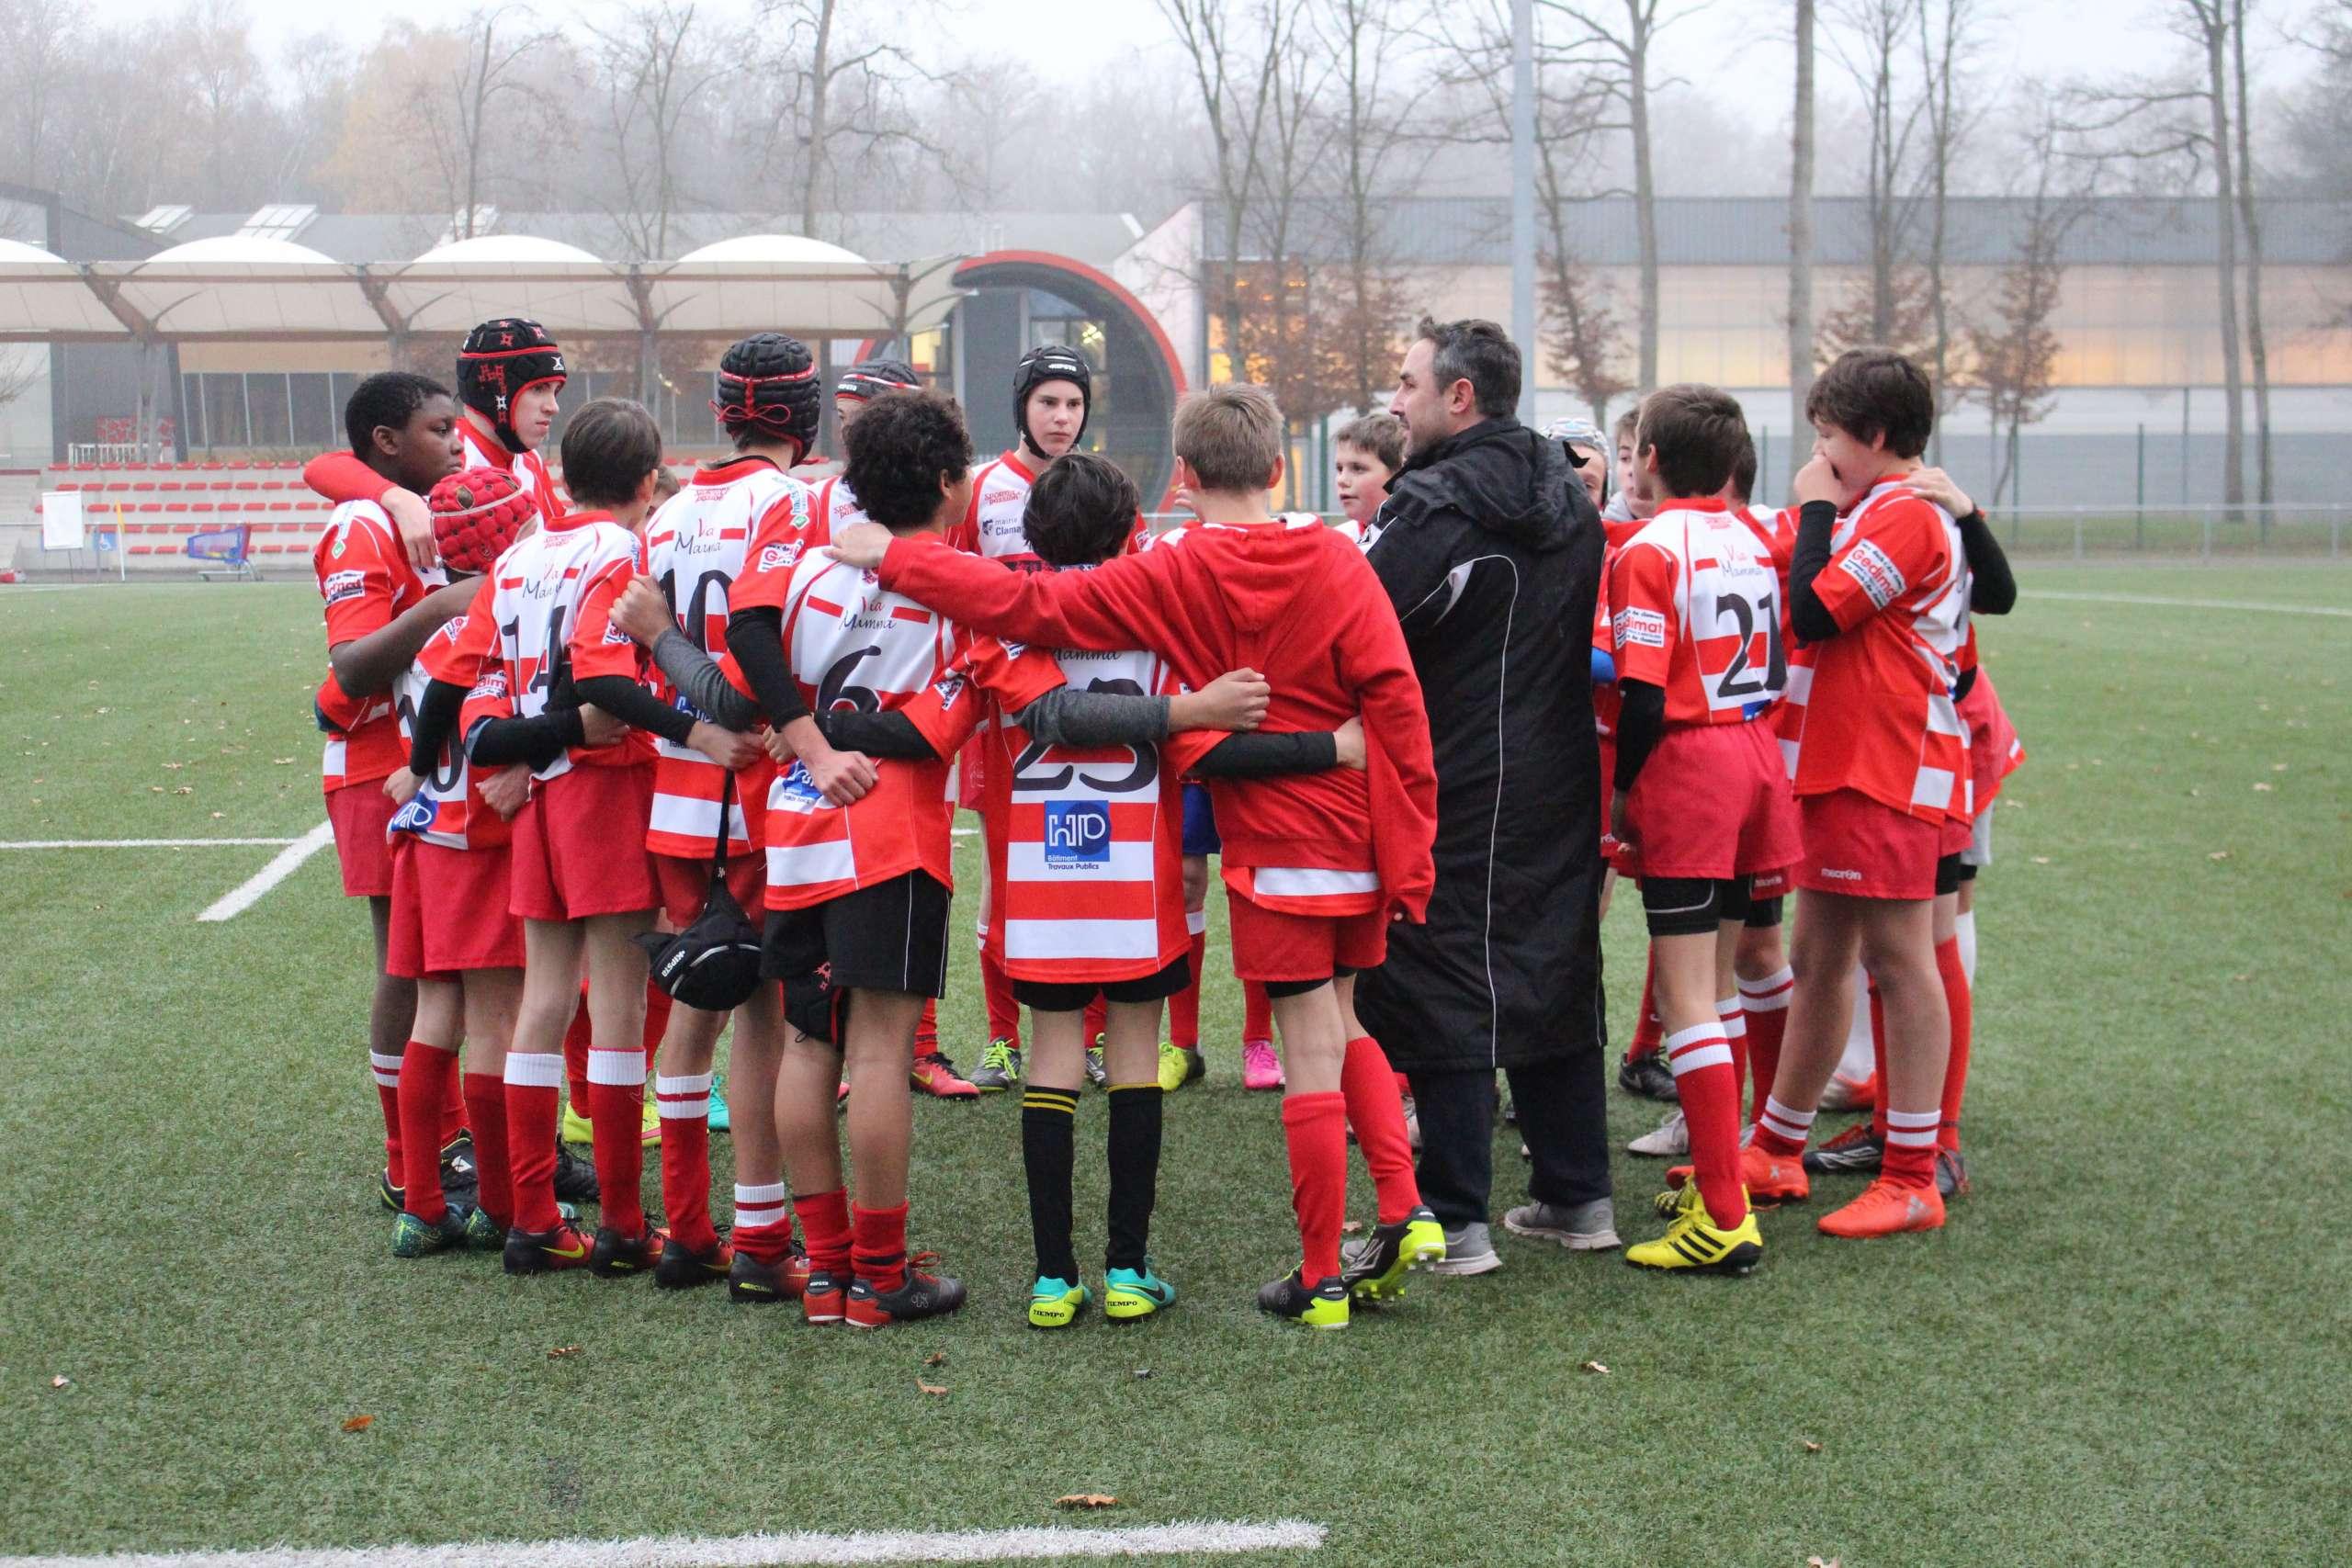 Clamart Rugby 92 -4e Rencontres CIFR U14 2004